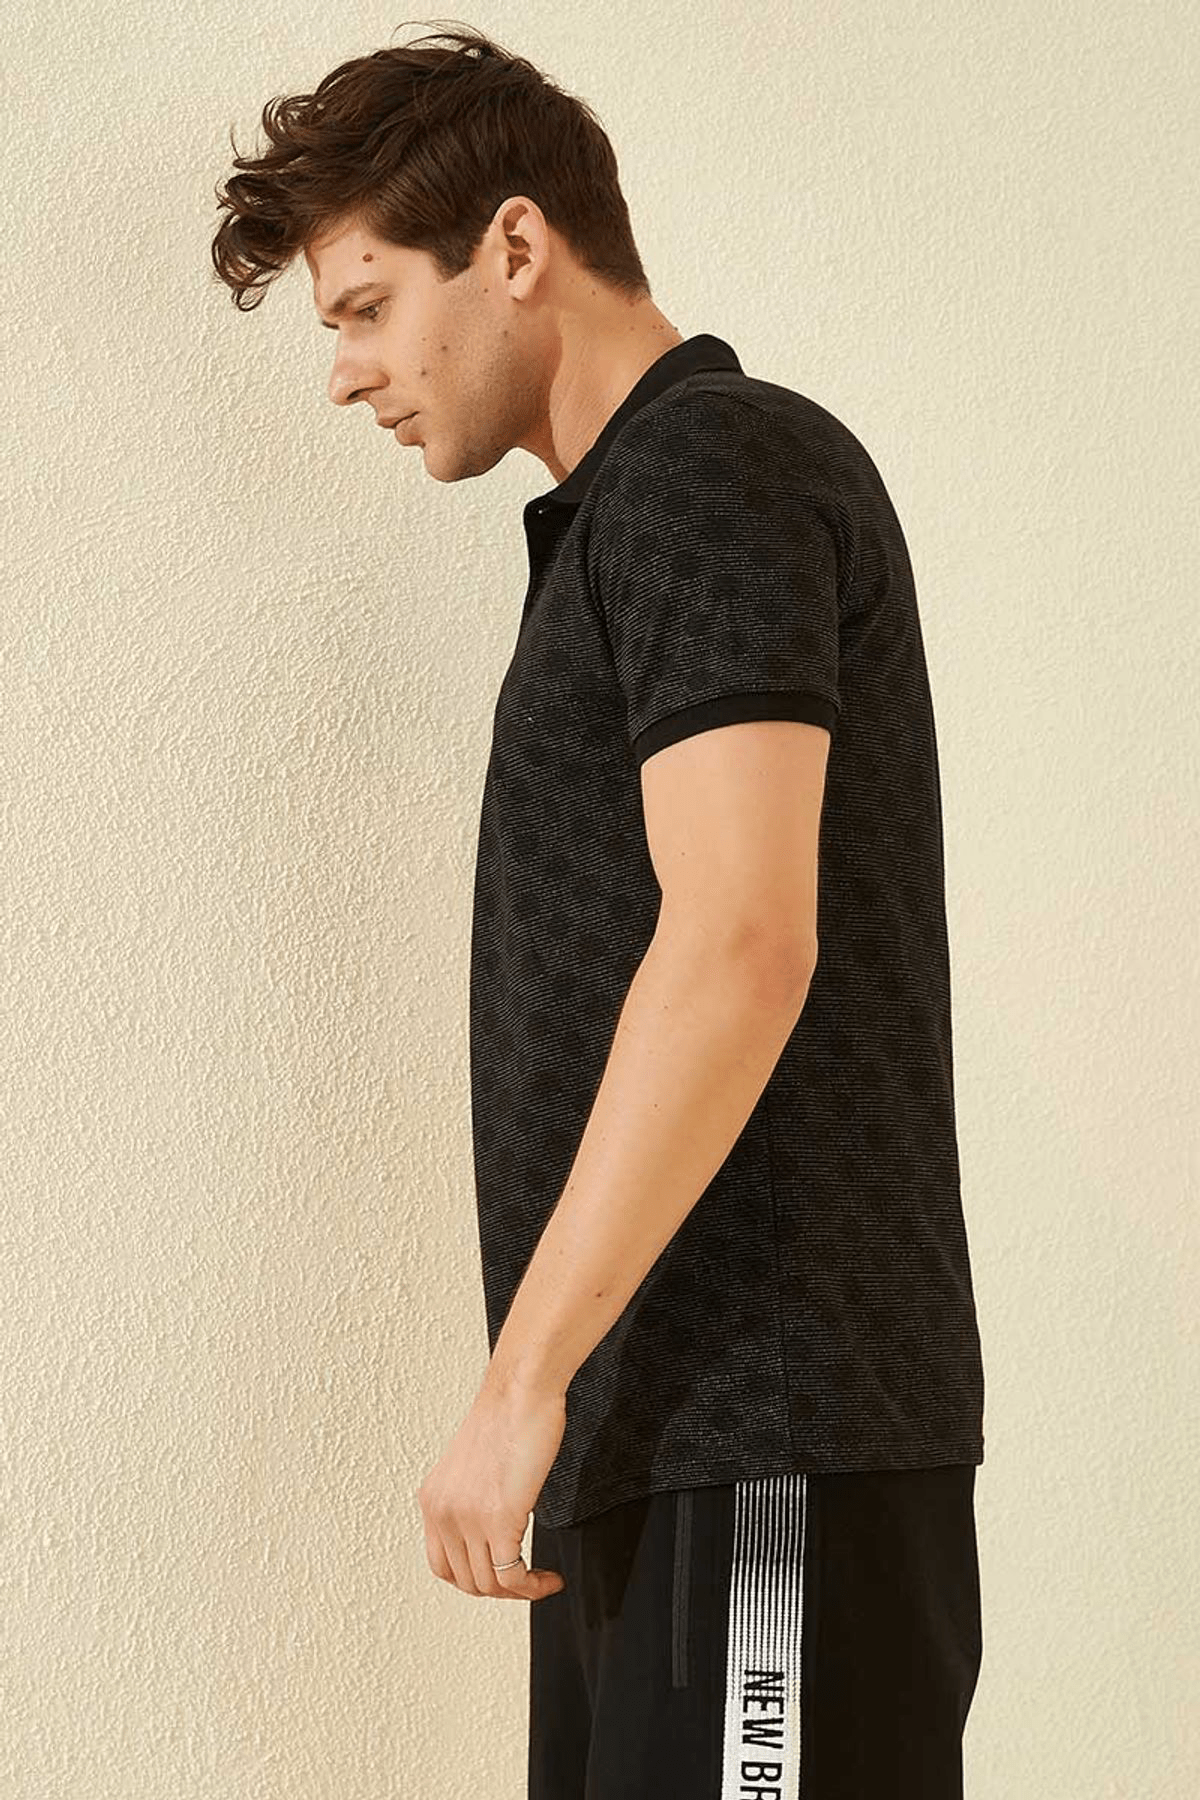 Tommy Life Baskılı Polo Yaka Siyah Erkek T-Shirt T08ER-87796_1 2